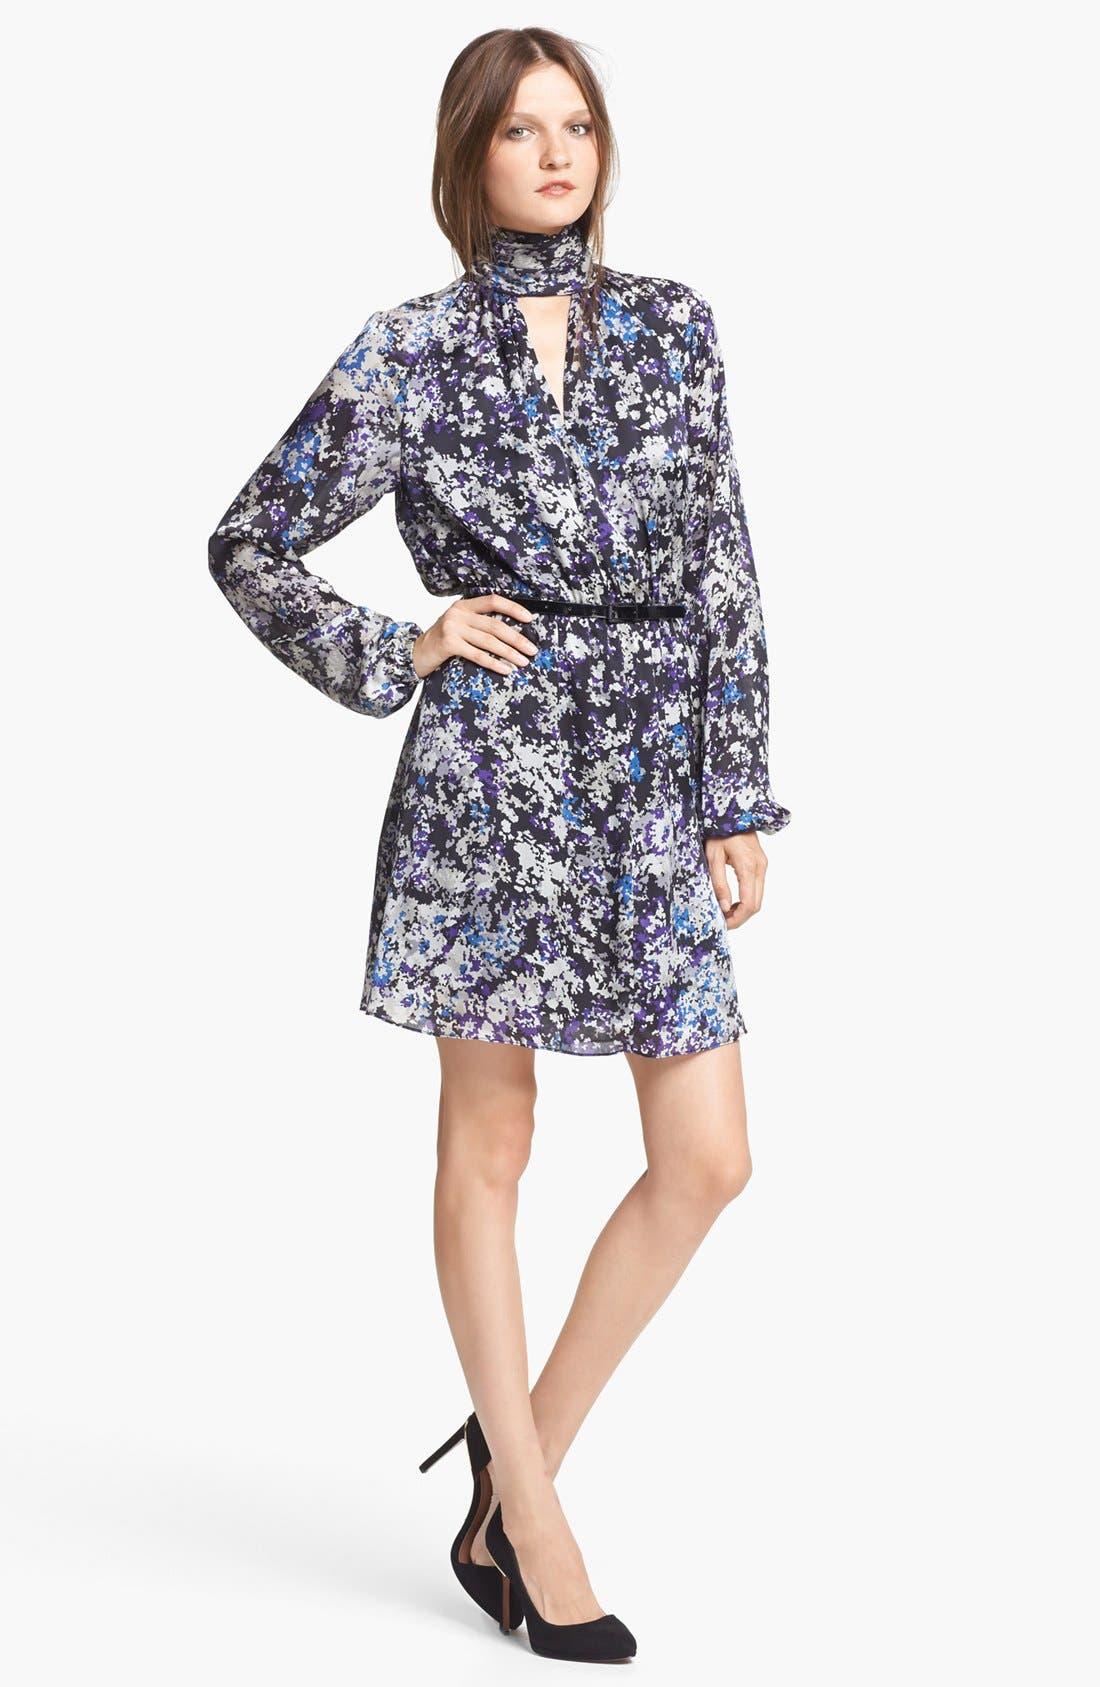 Alternate Image 1 Selected - Rachel Zoe 'Maldives' Print Satin Blouson Dress